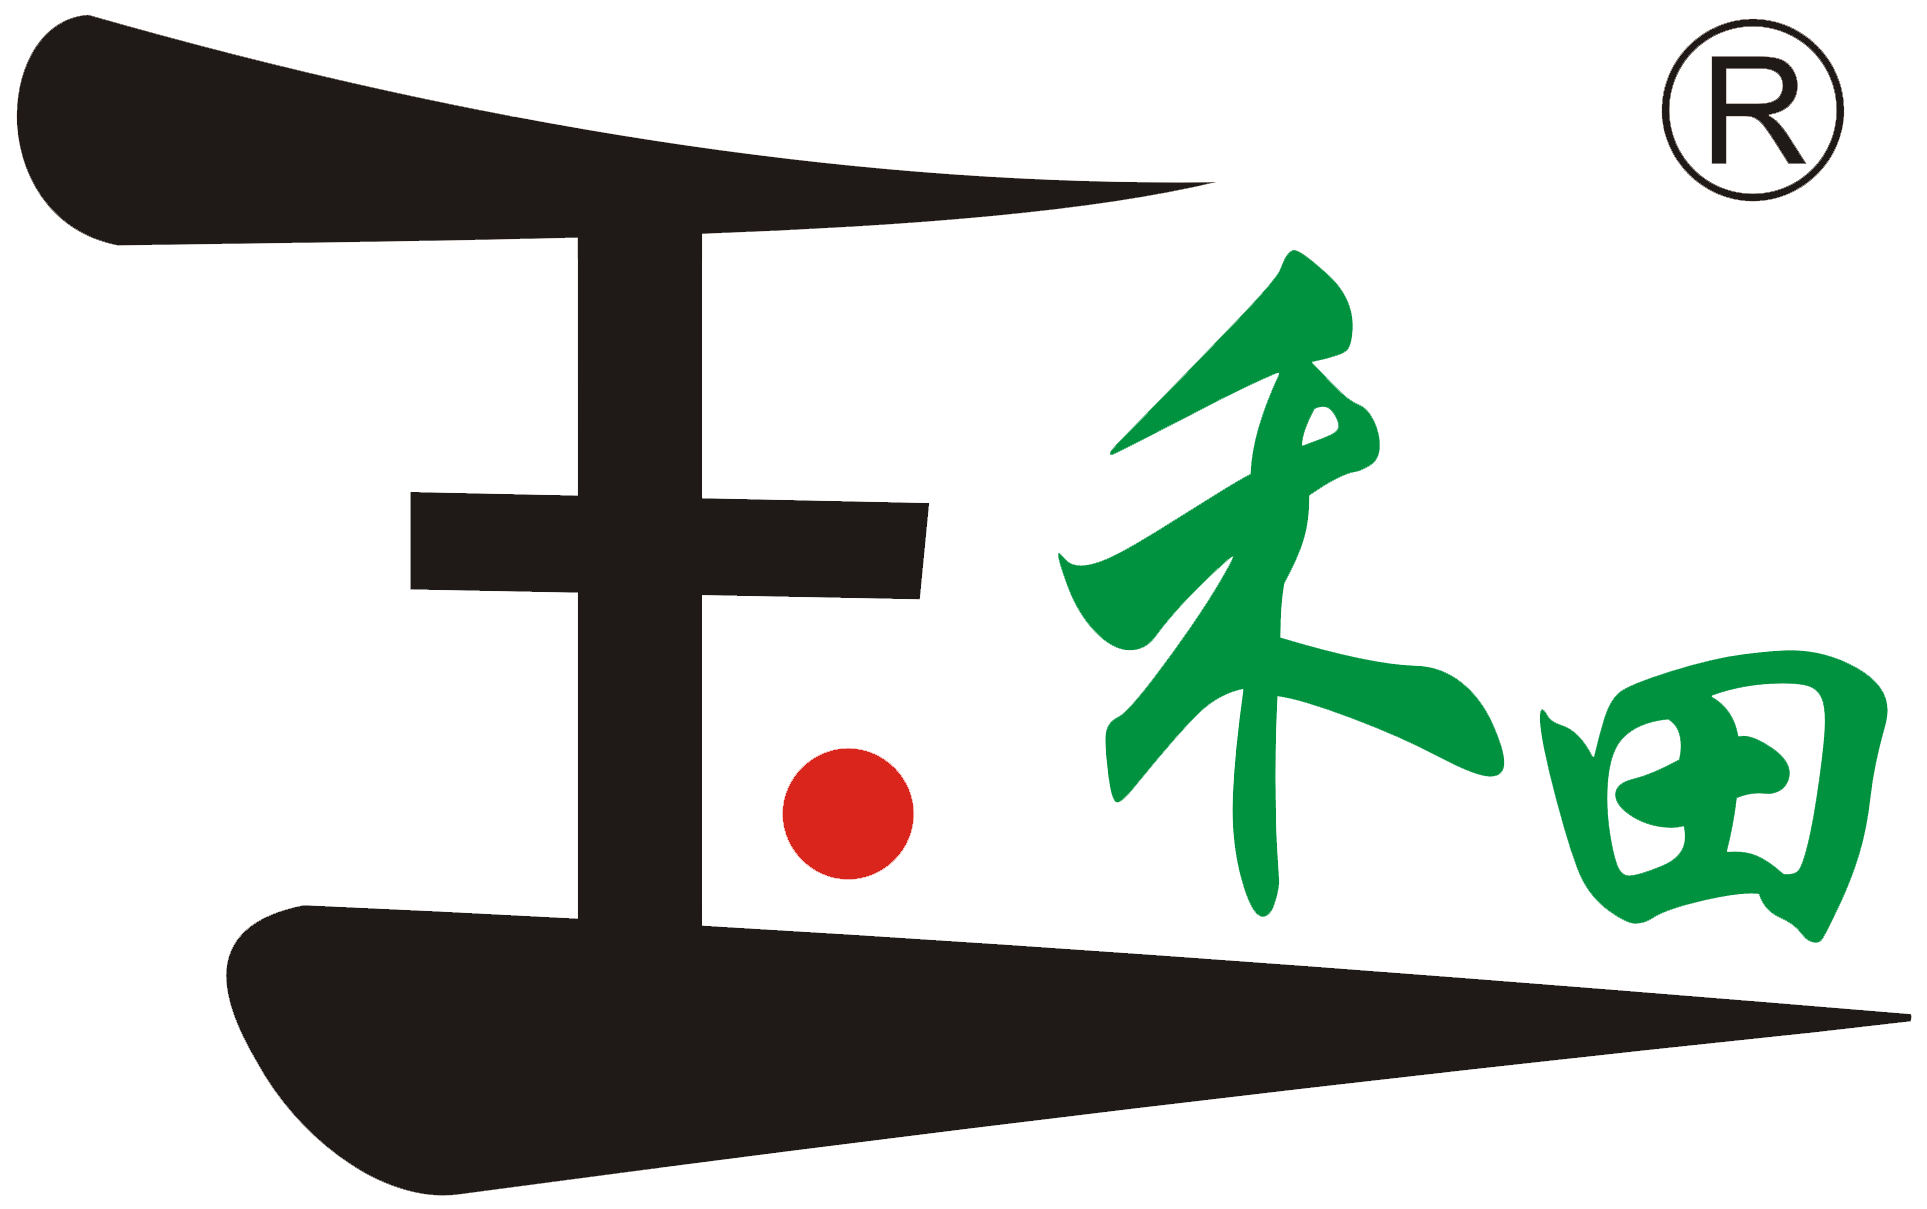 玉和田.png